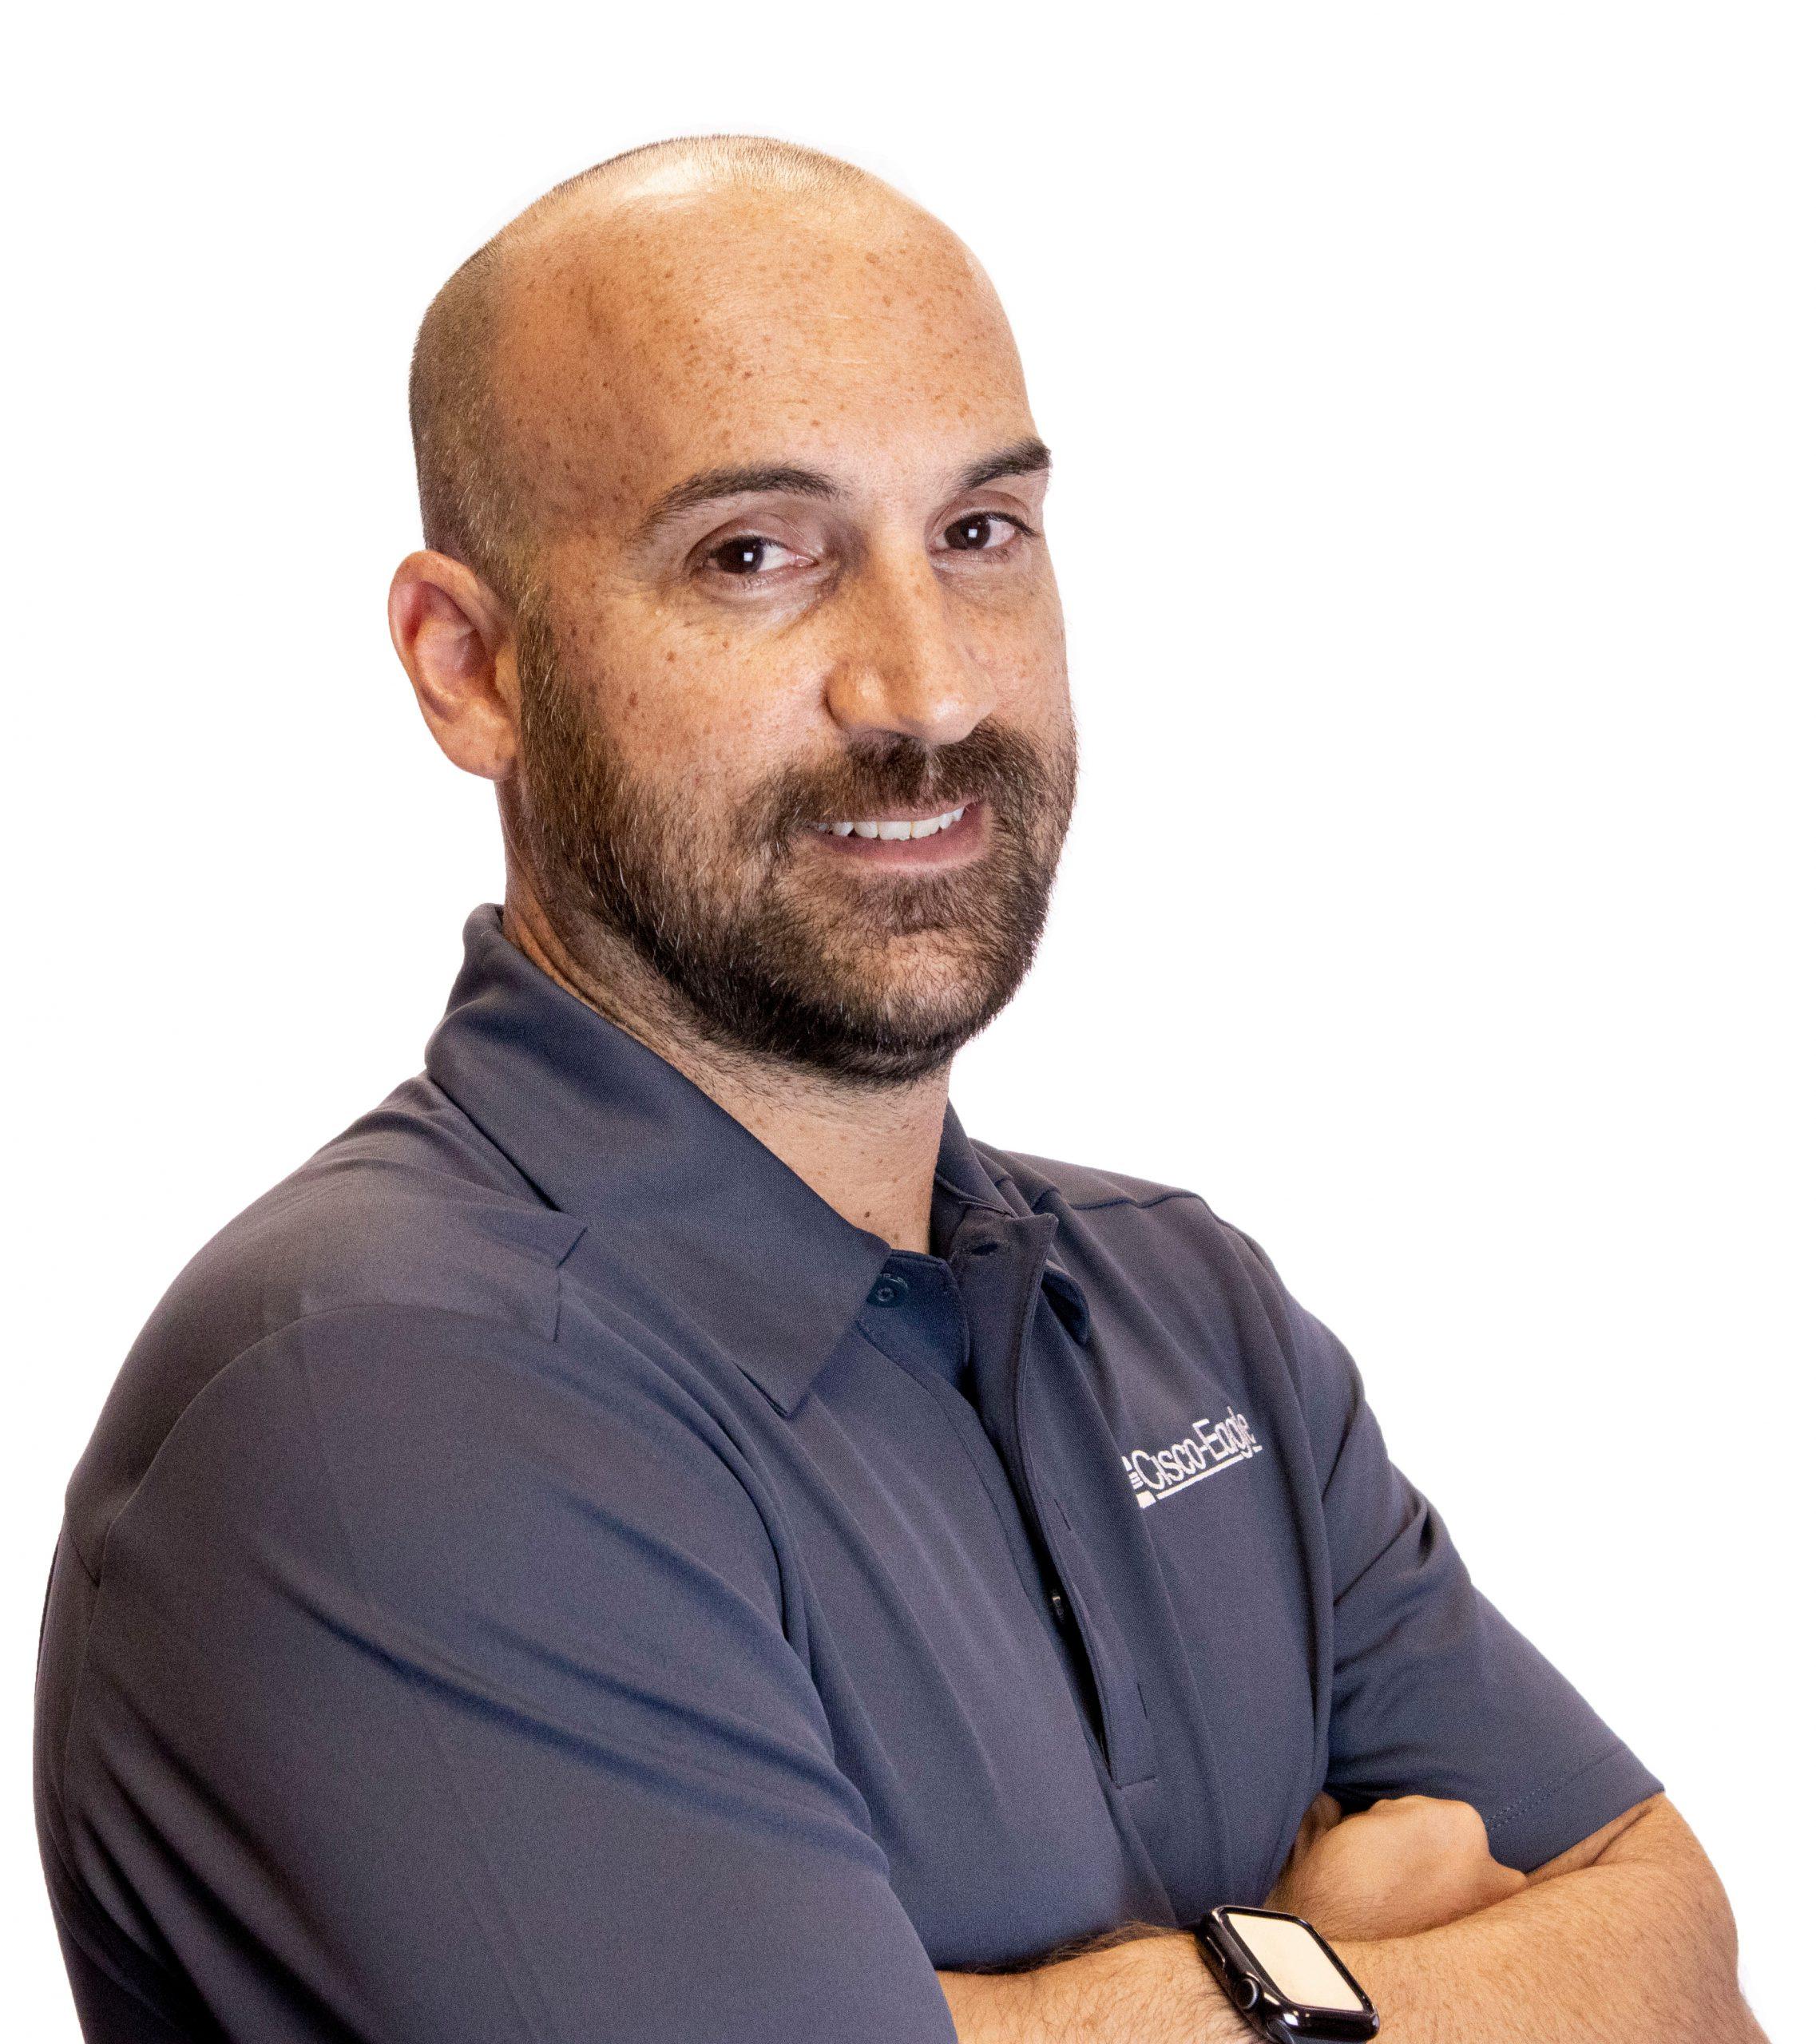 David Sahyouni of Cisco-Eagle